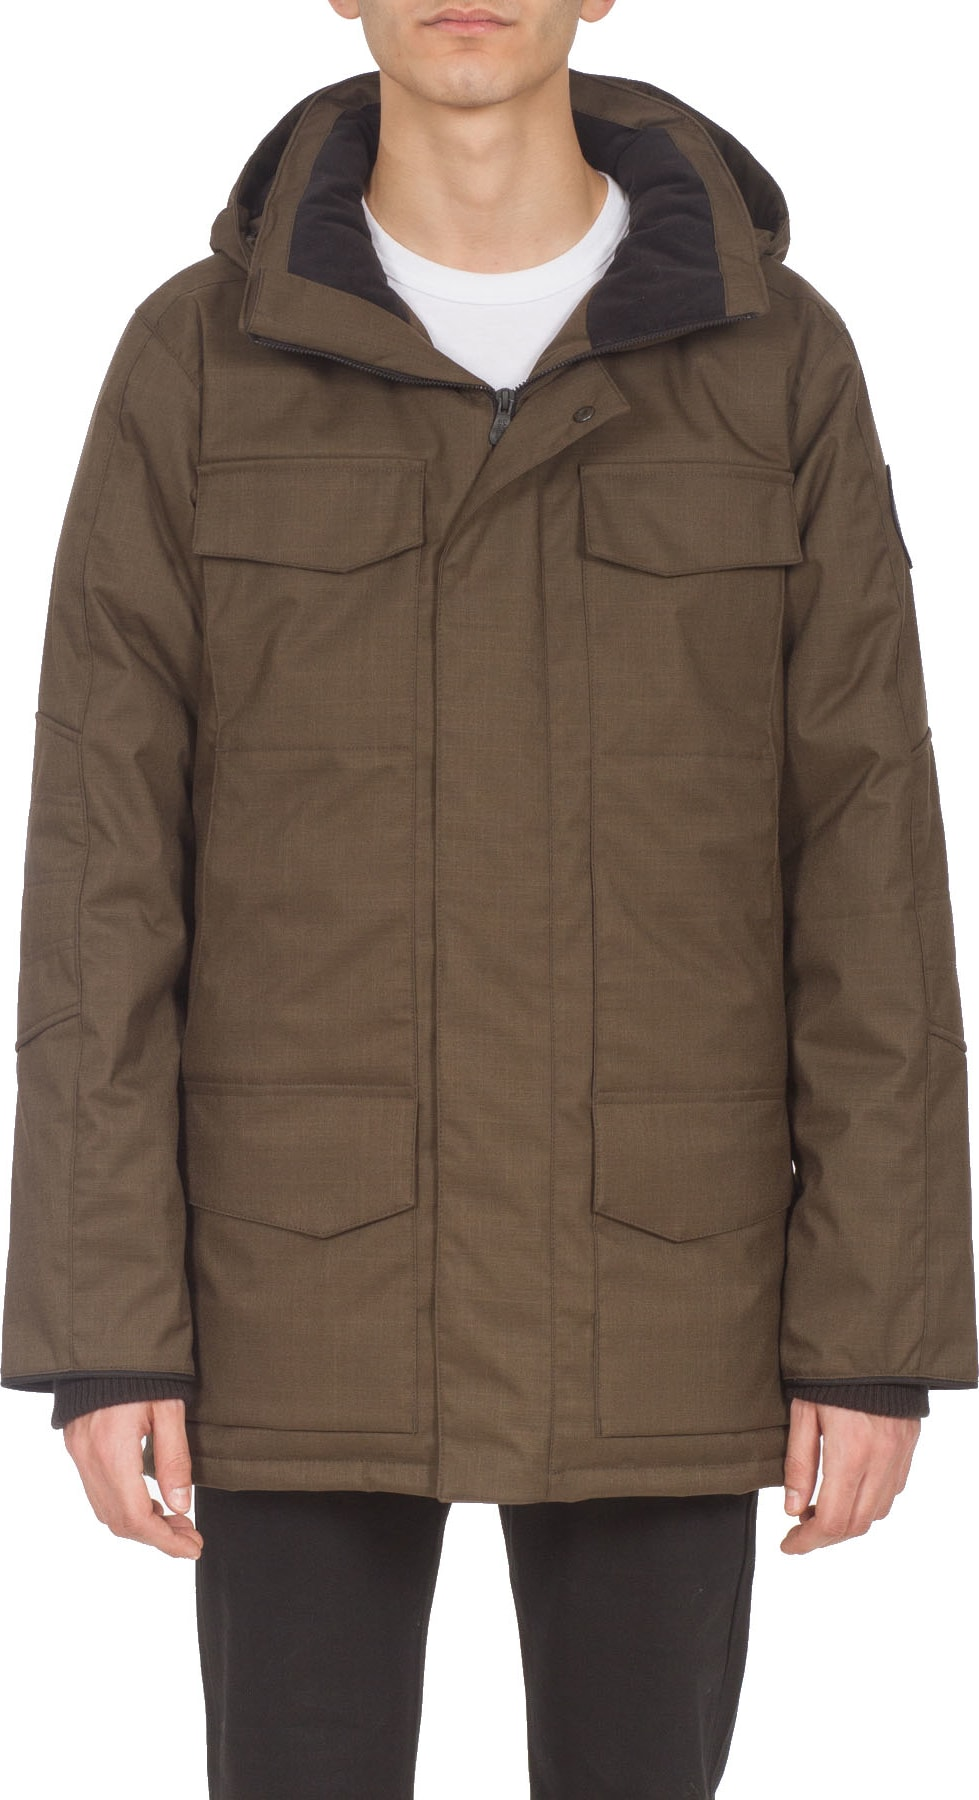 f7dc4f761 Canada Goose - Black Label Windermere Coat - Moss